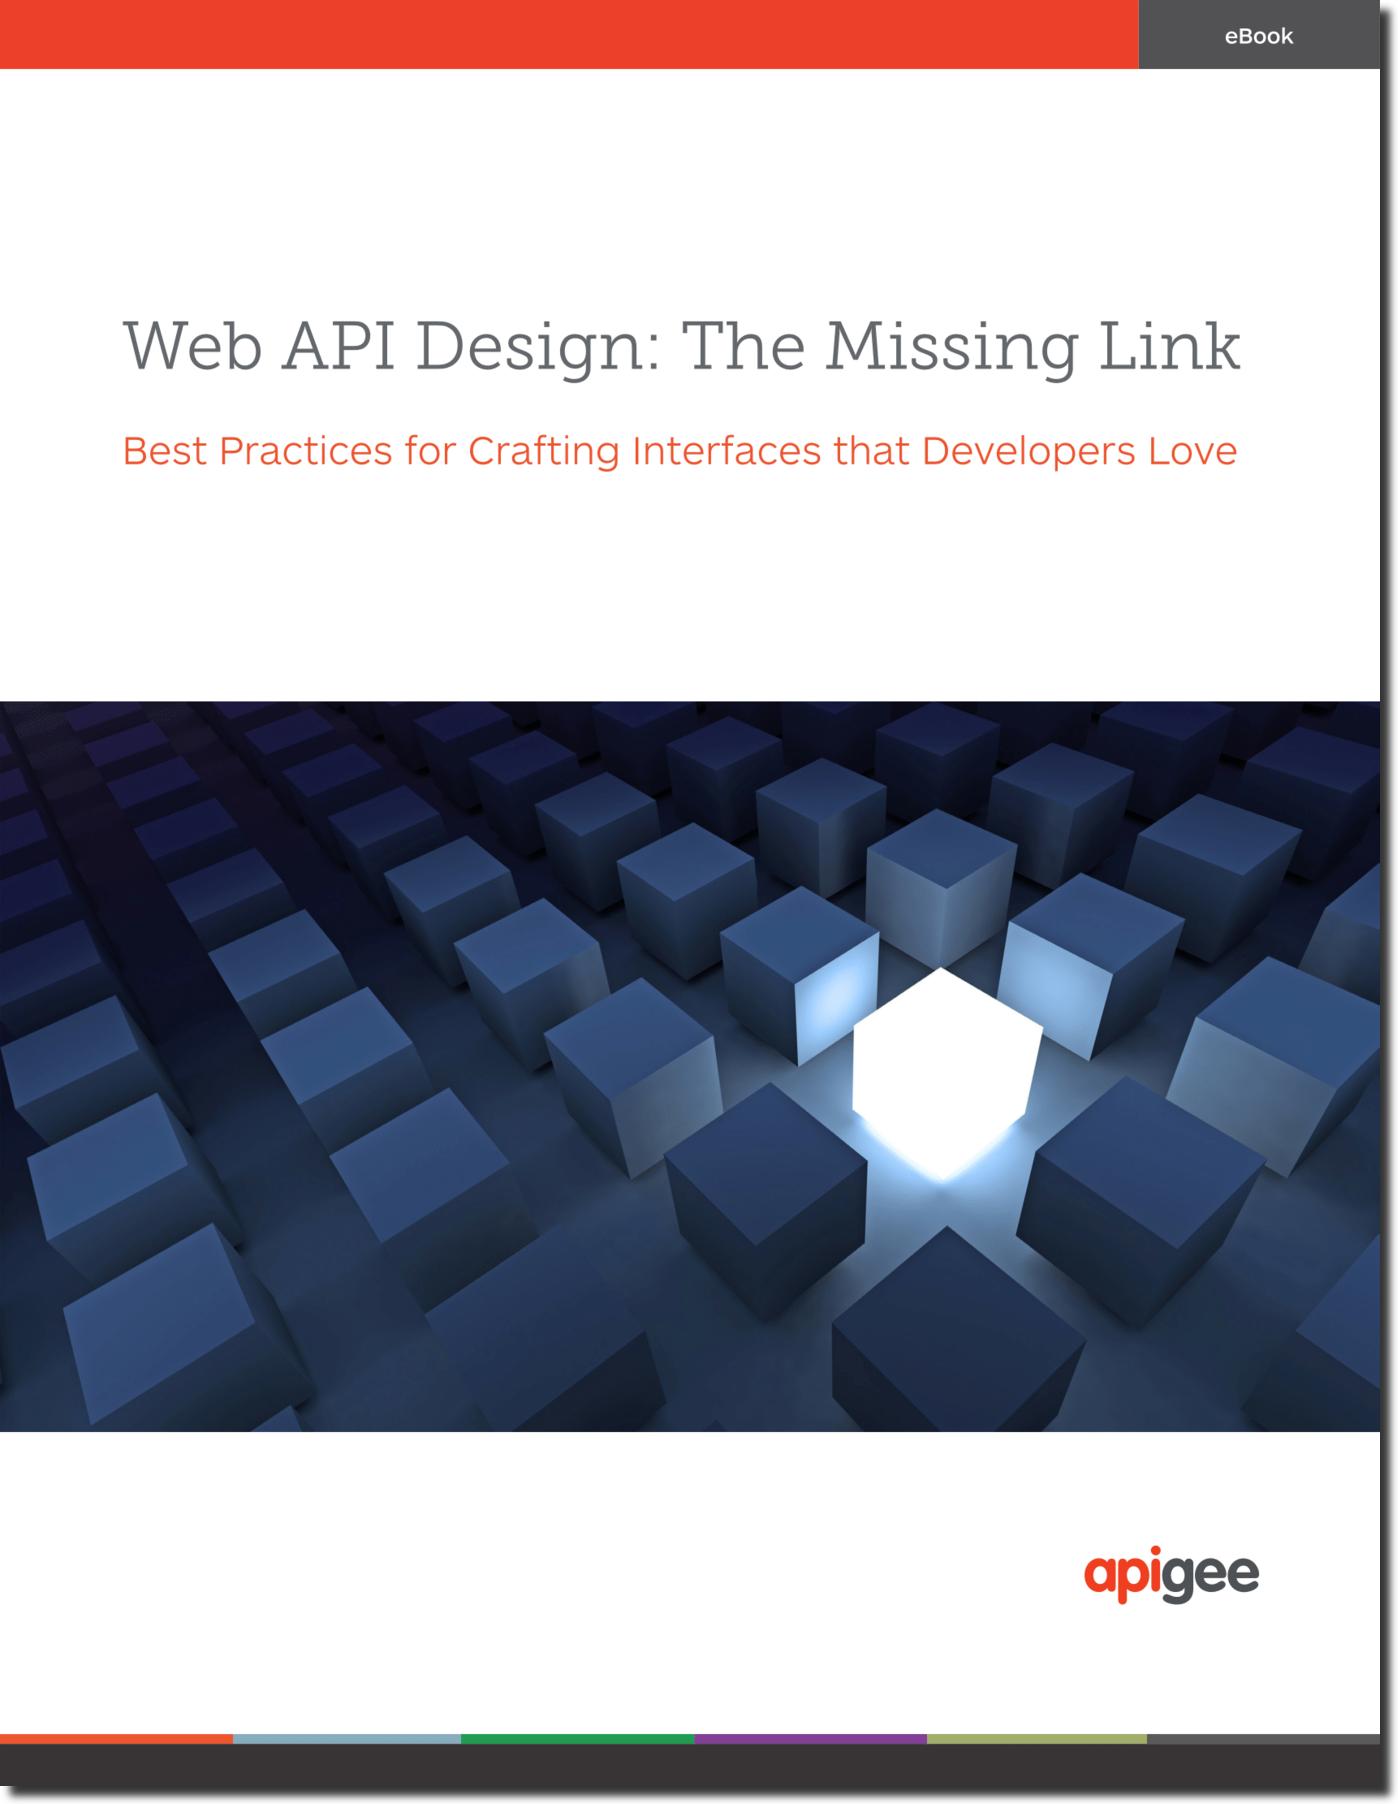 web application design patterns ebook